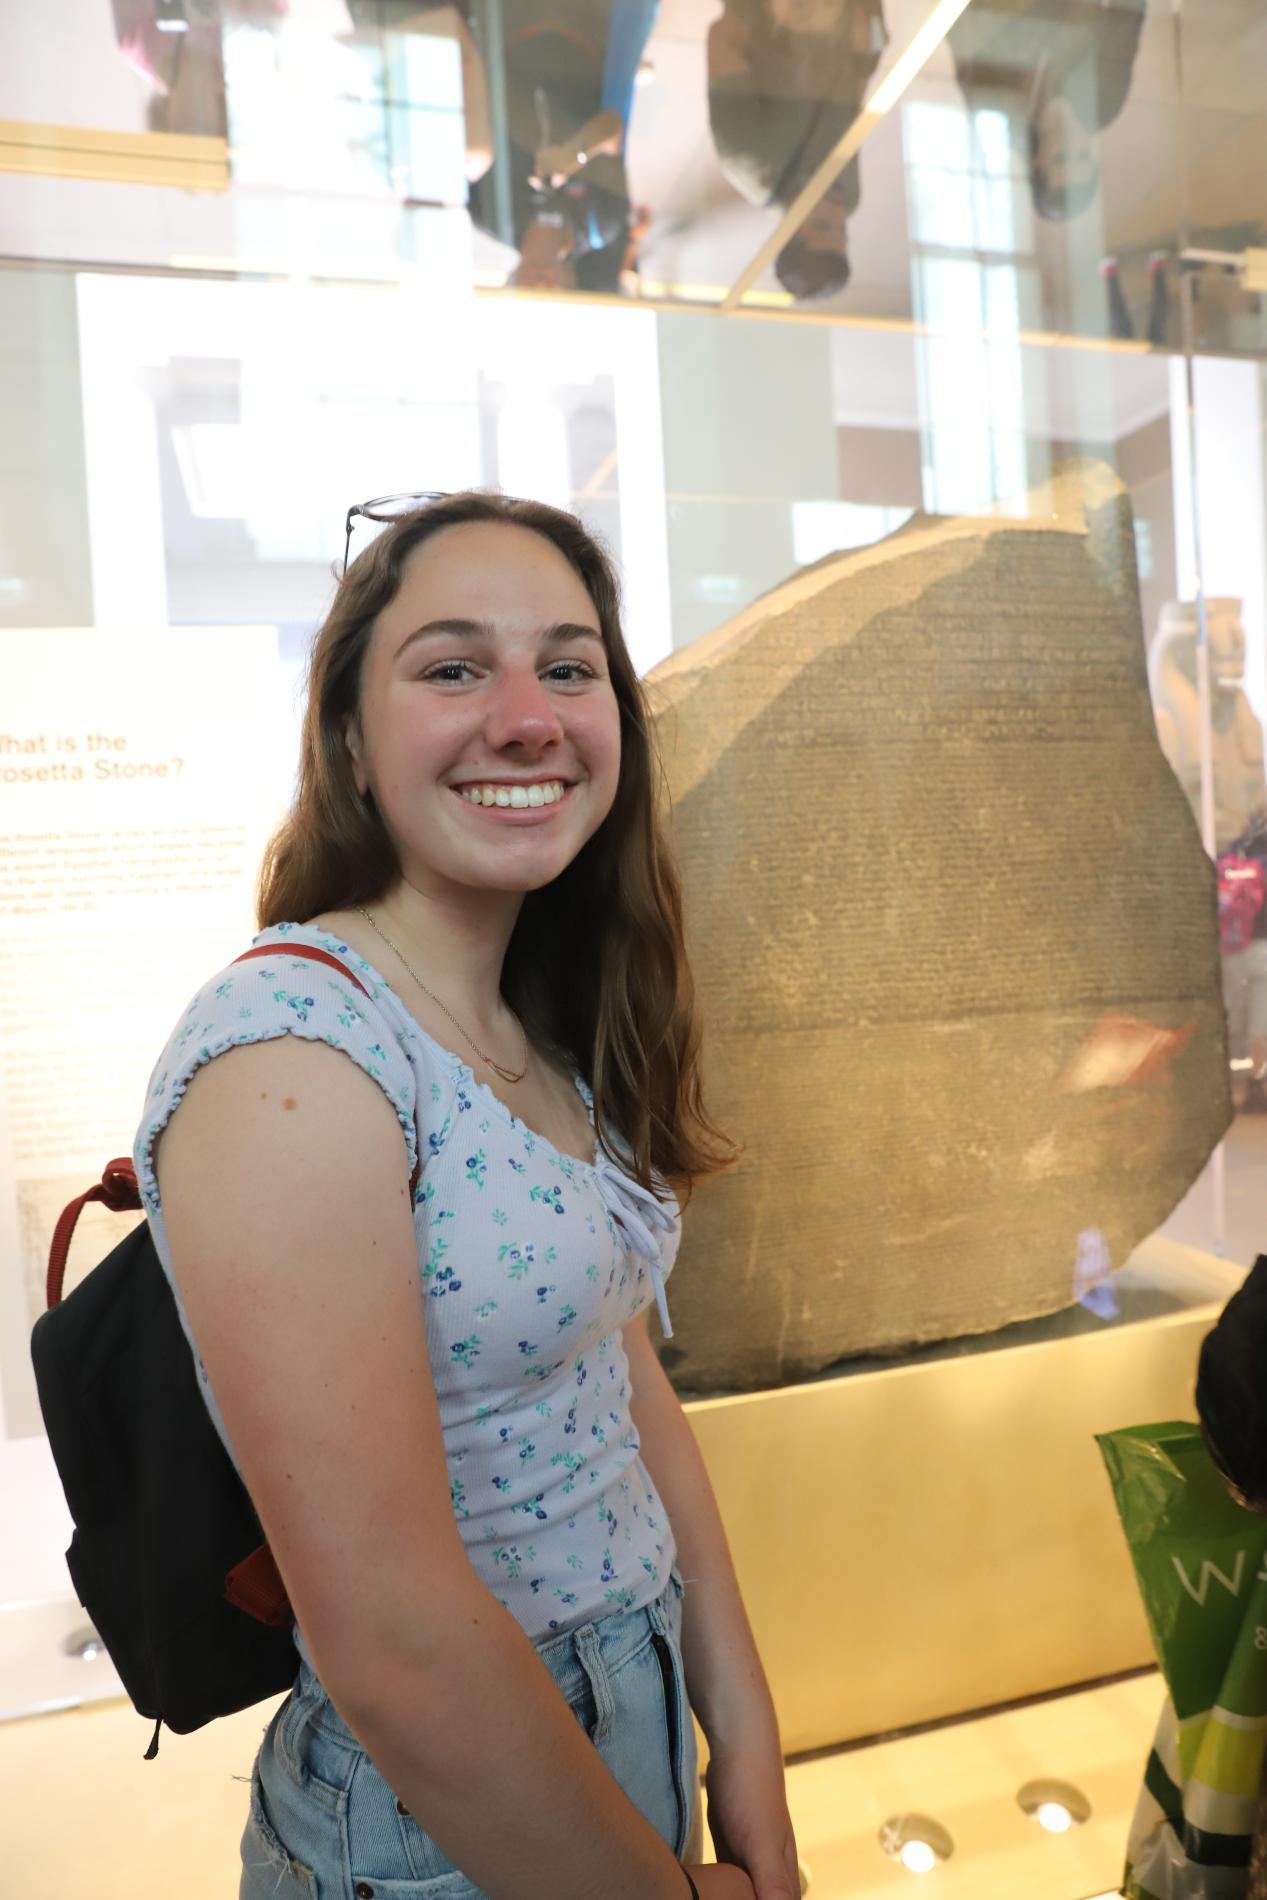 High school teen at the Rosetta Stone